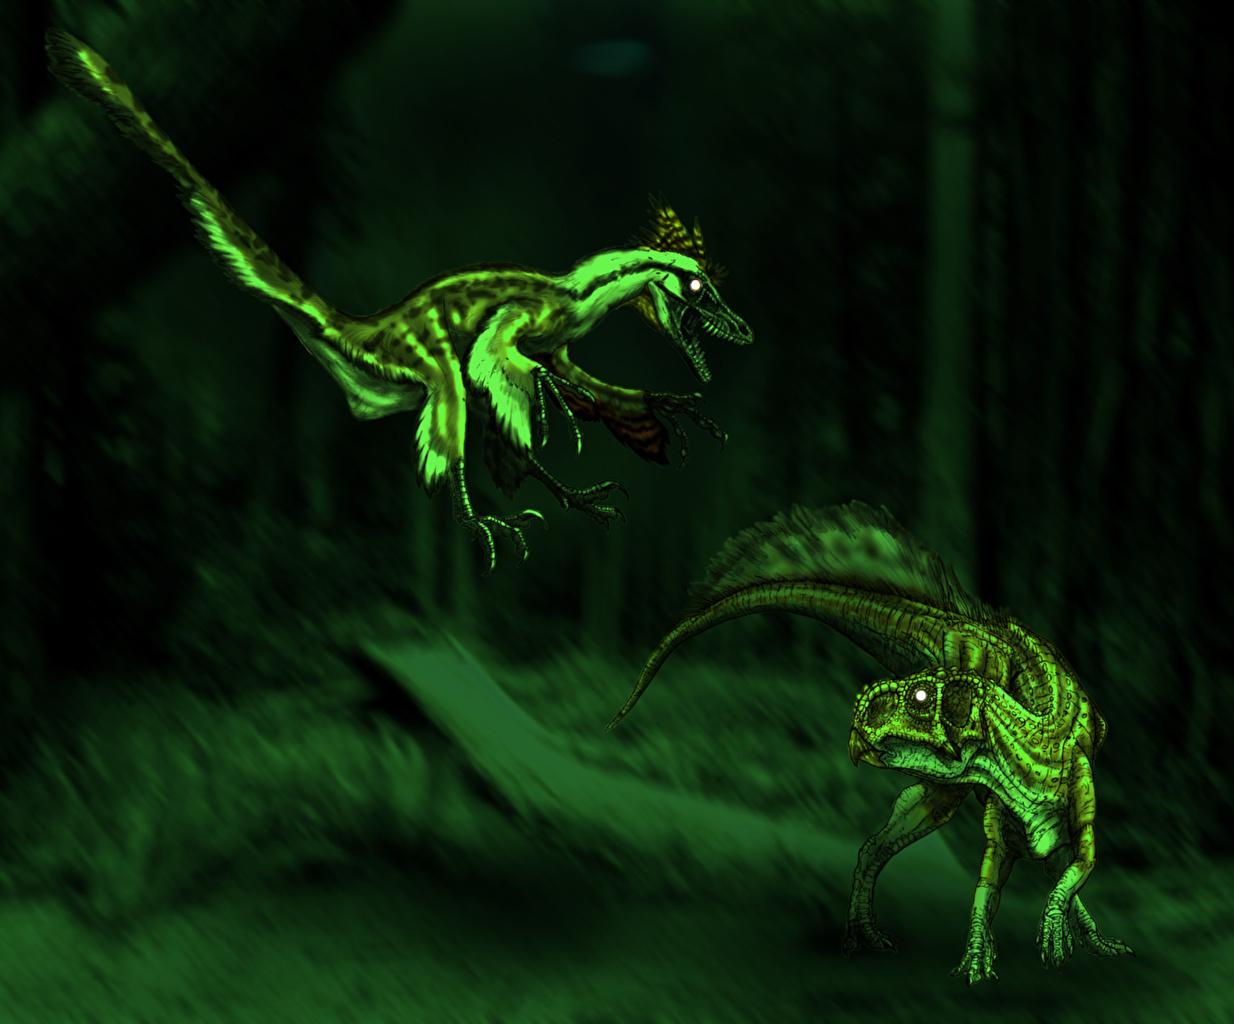 Pictures Dinosaurs Sinornithosaurus hunting Psittacosaurus Two animal Ancient animals 2 Animals